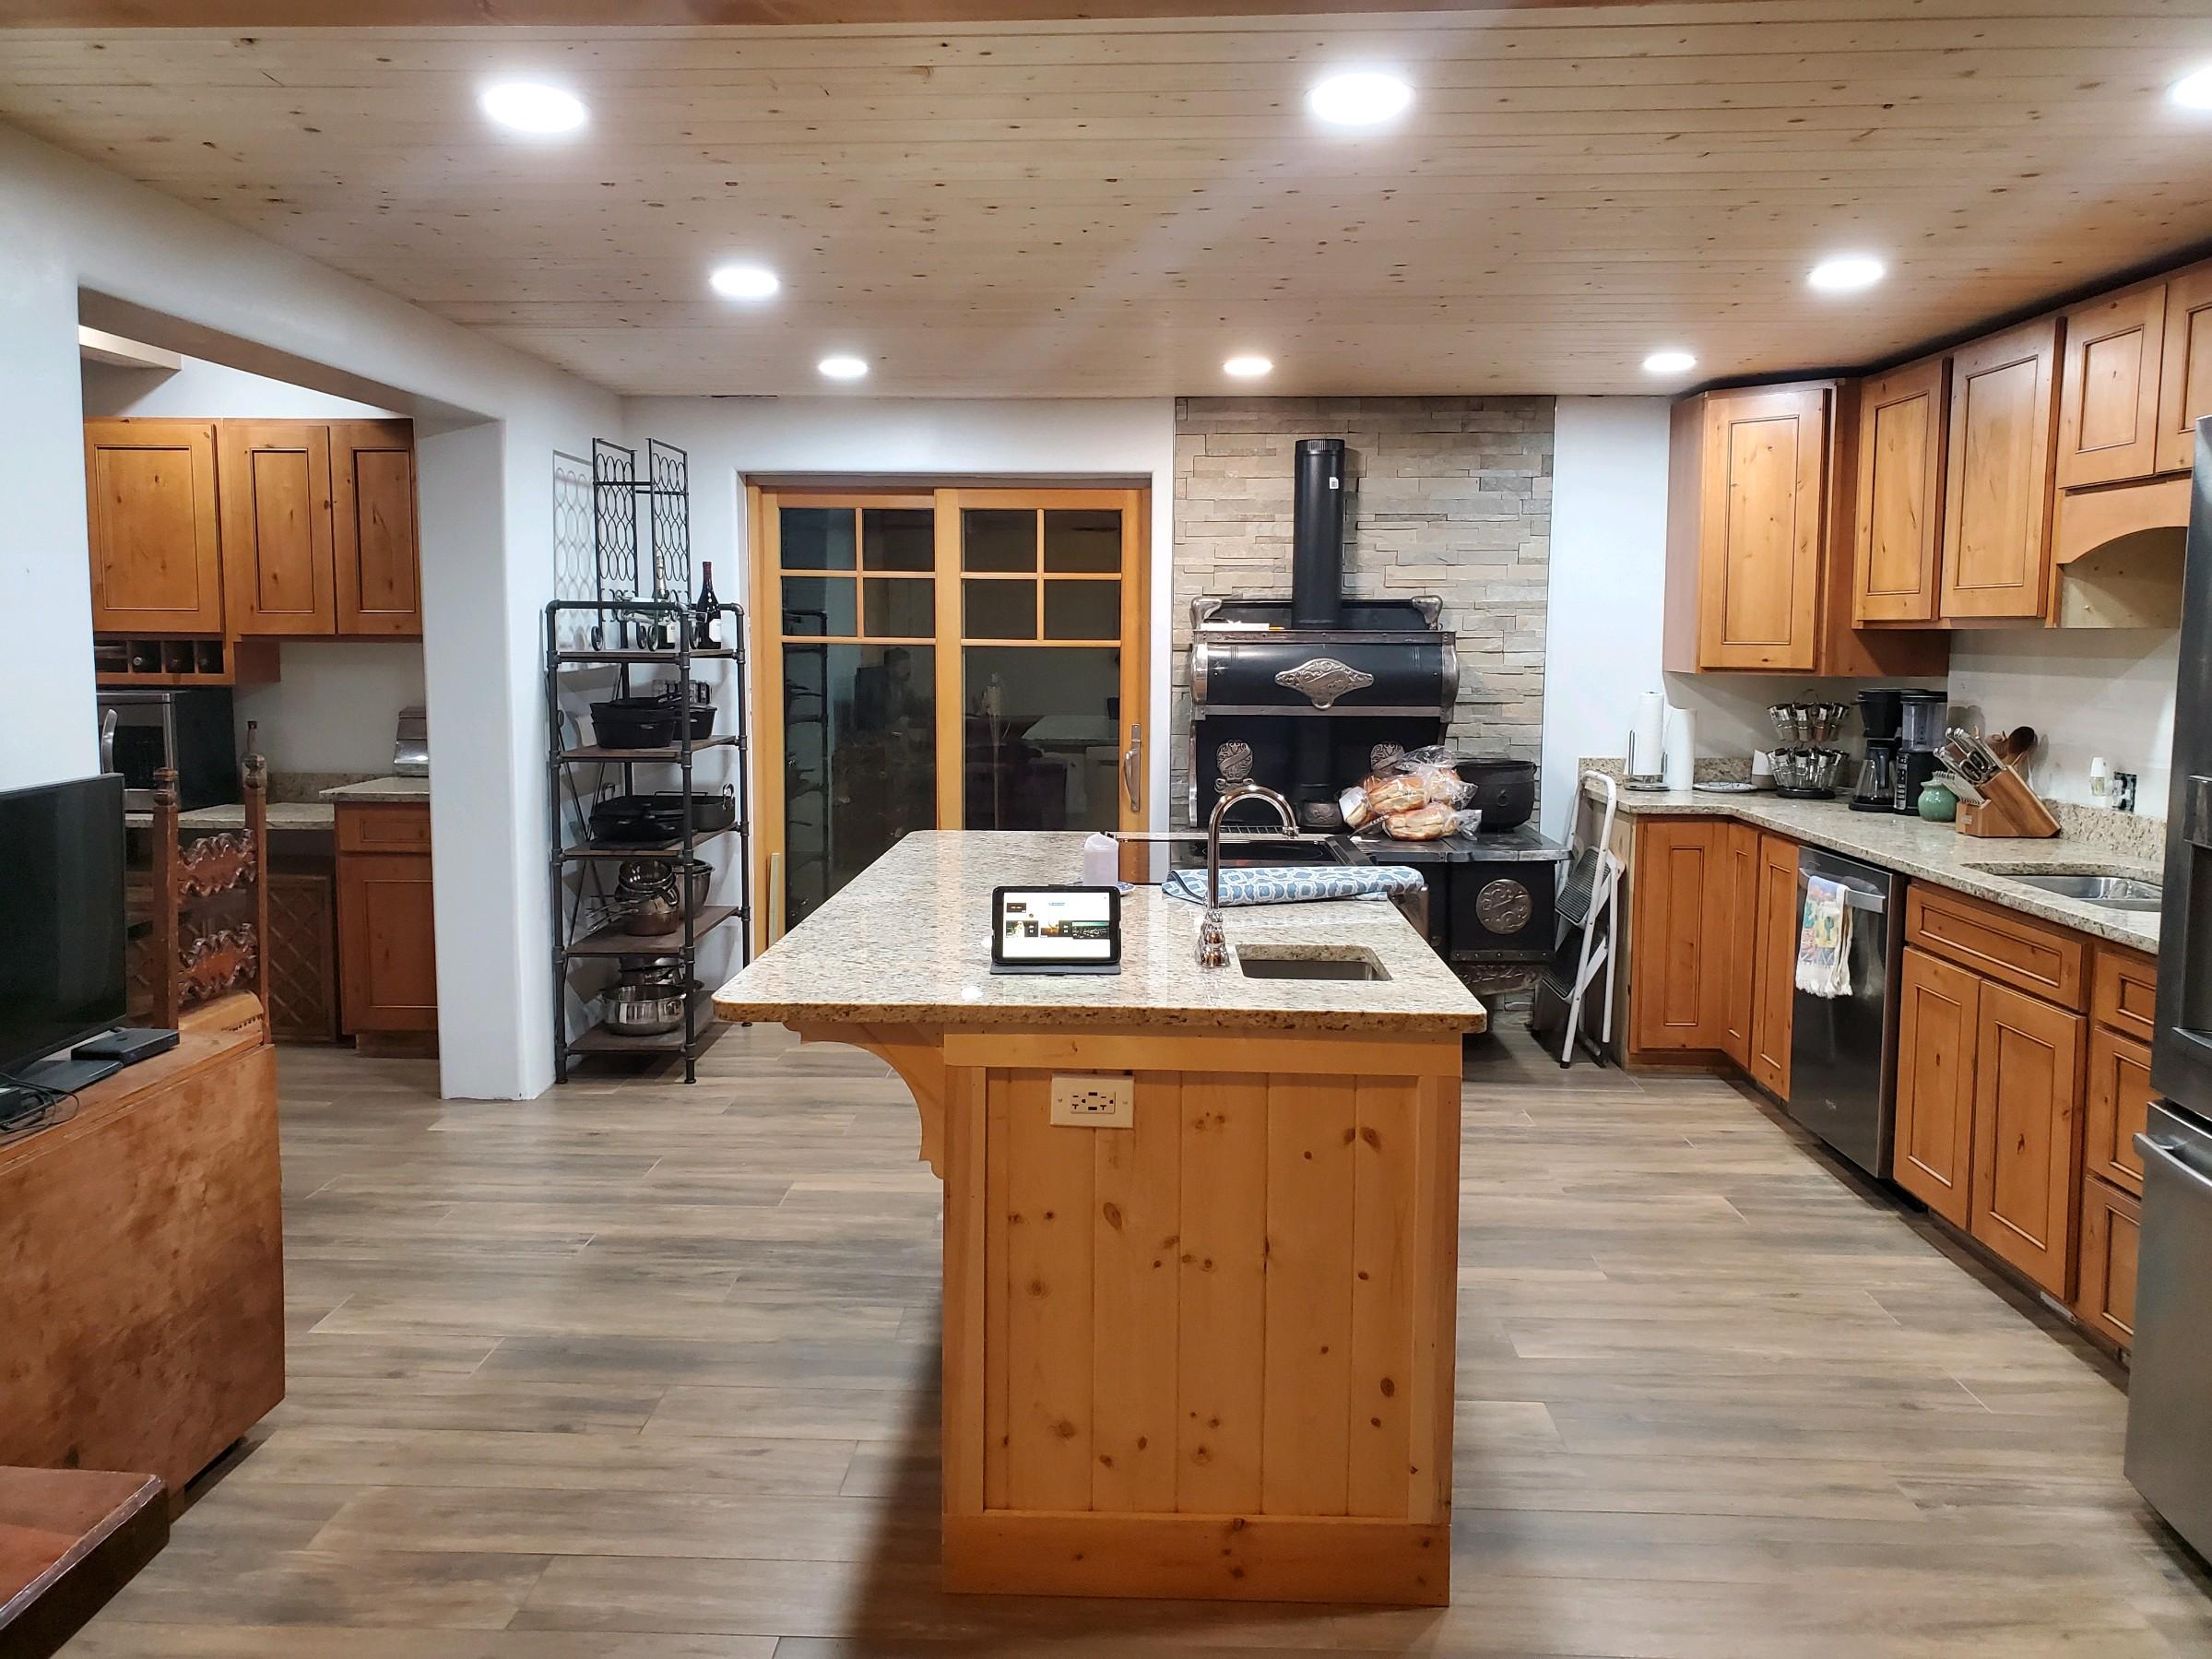 Image showing kitchen remodel